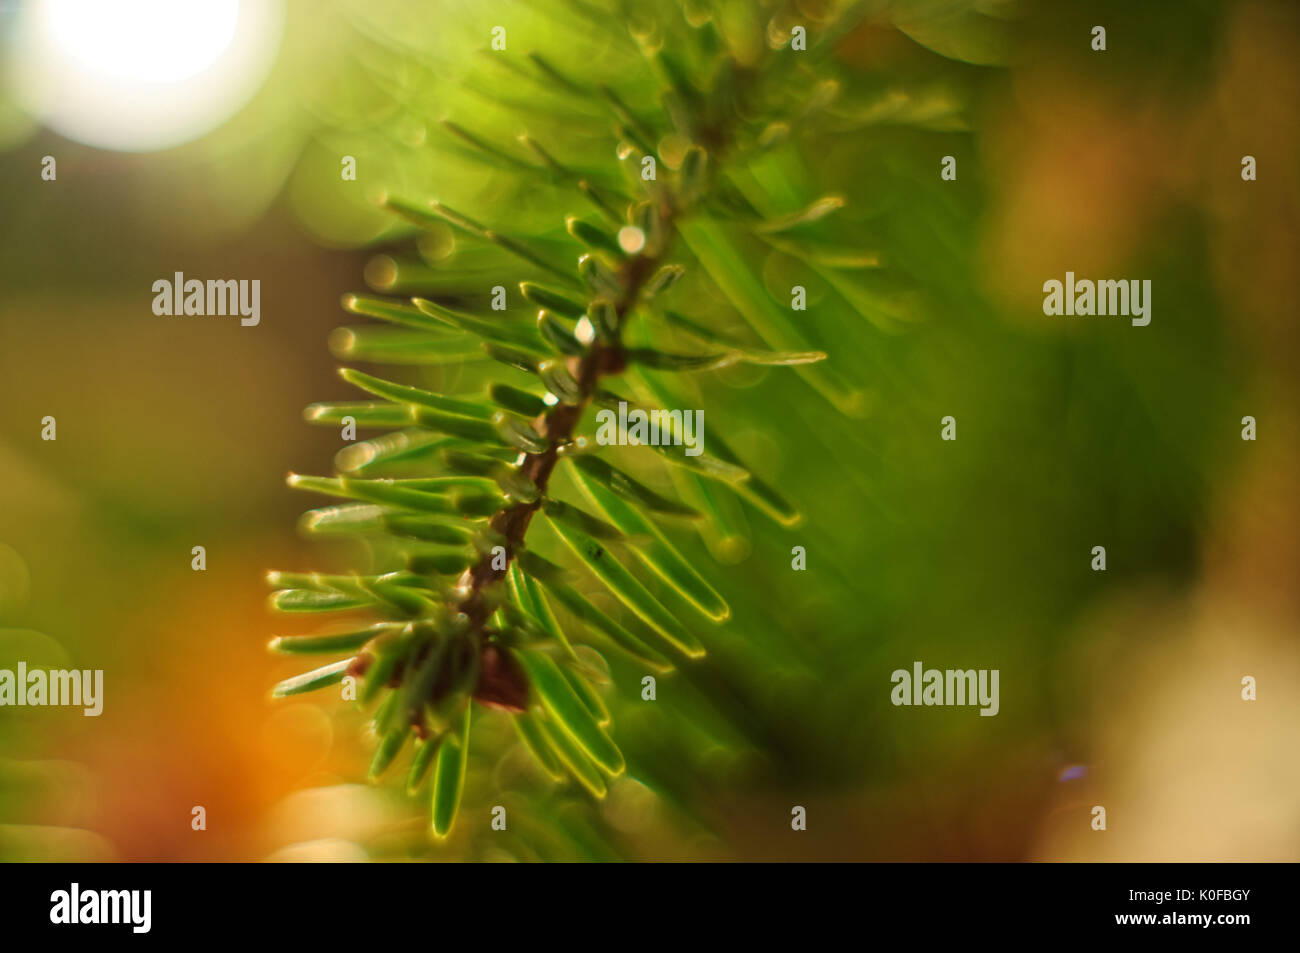 Christmas tree twig. - Stock Image